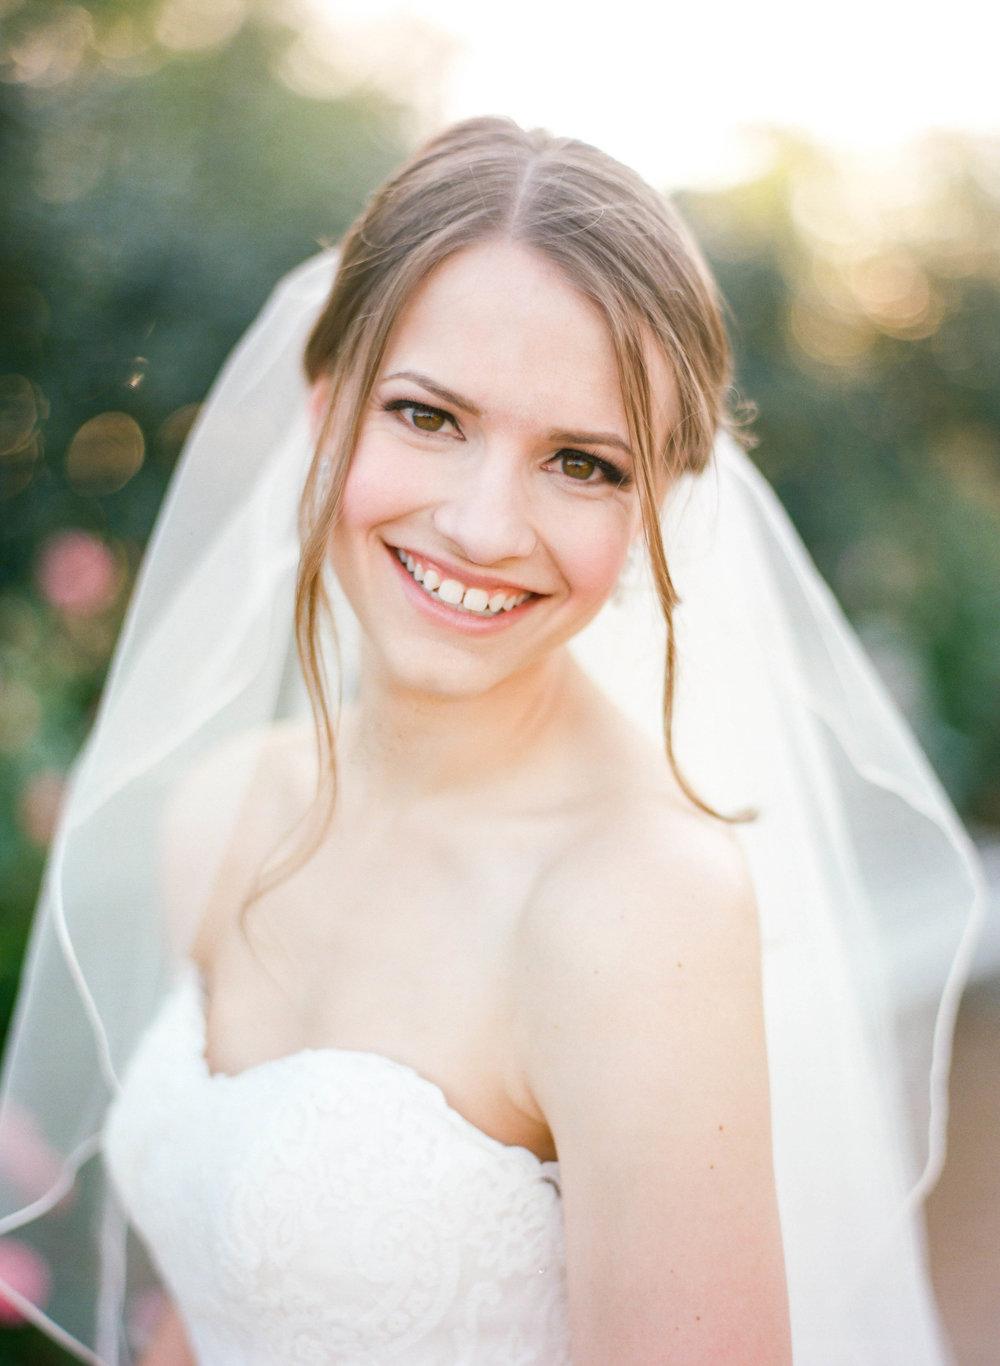 Houston-Wedding-Photographer-Film-Fine-Art-Bridals-Dana+Fernandez-Photography-12.jpg